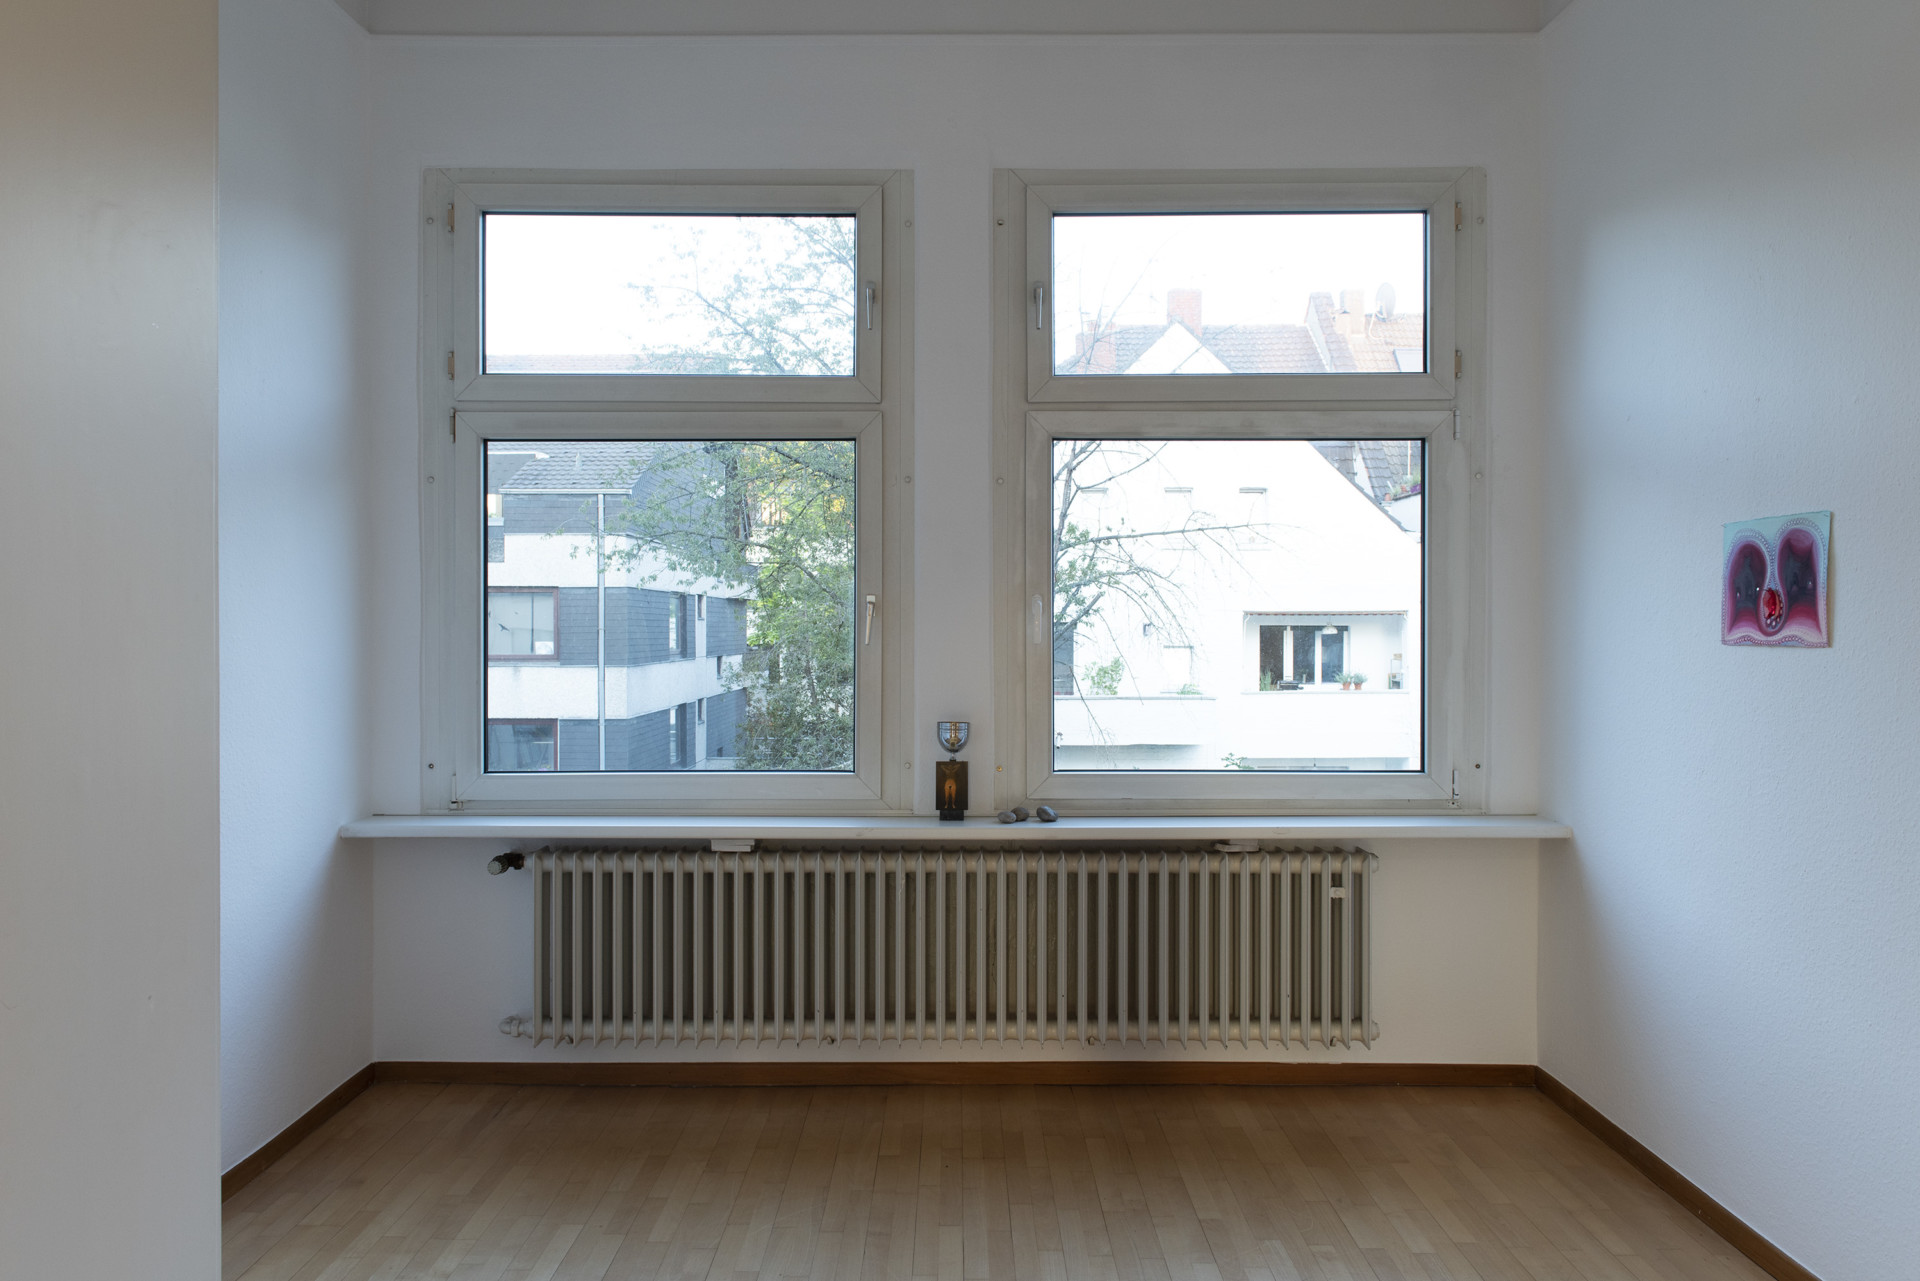 lucashirsch.com Kinke Kooi Visit